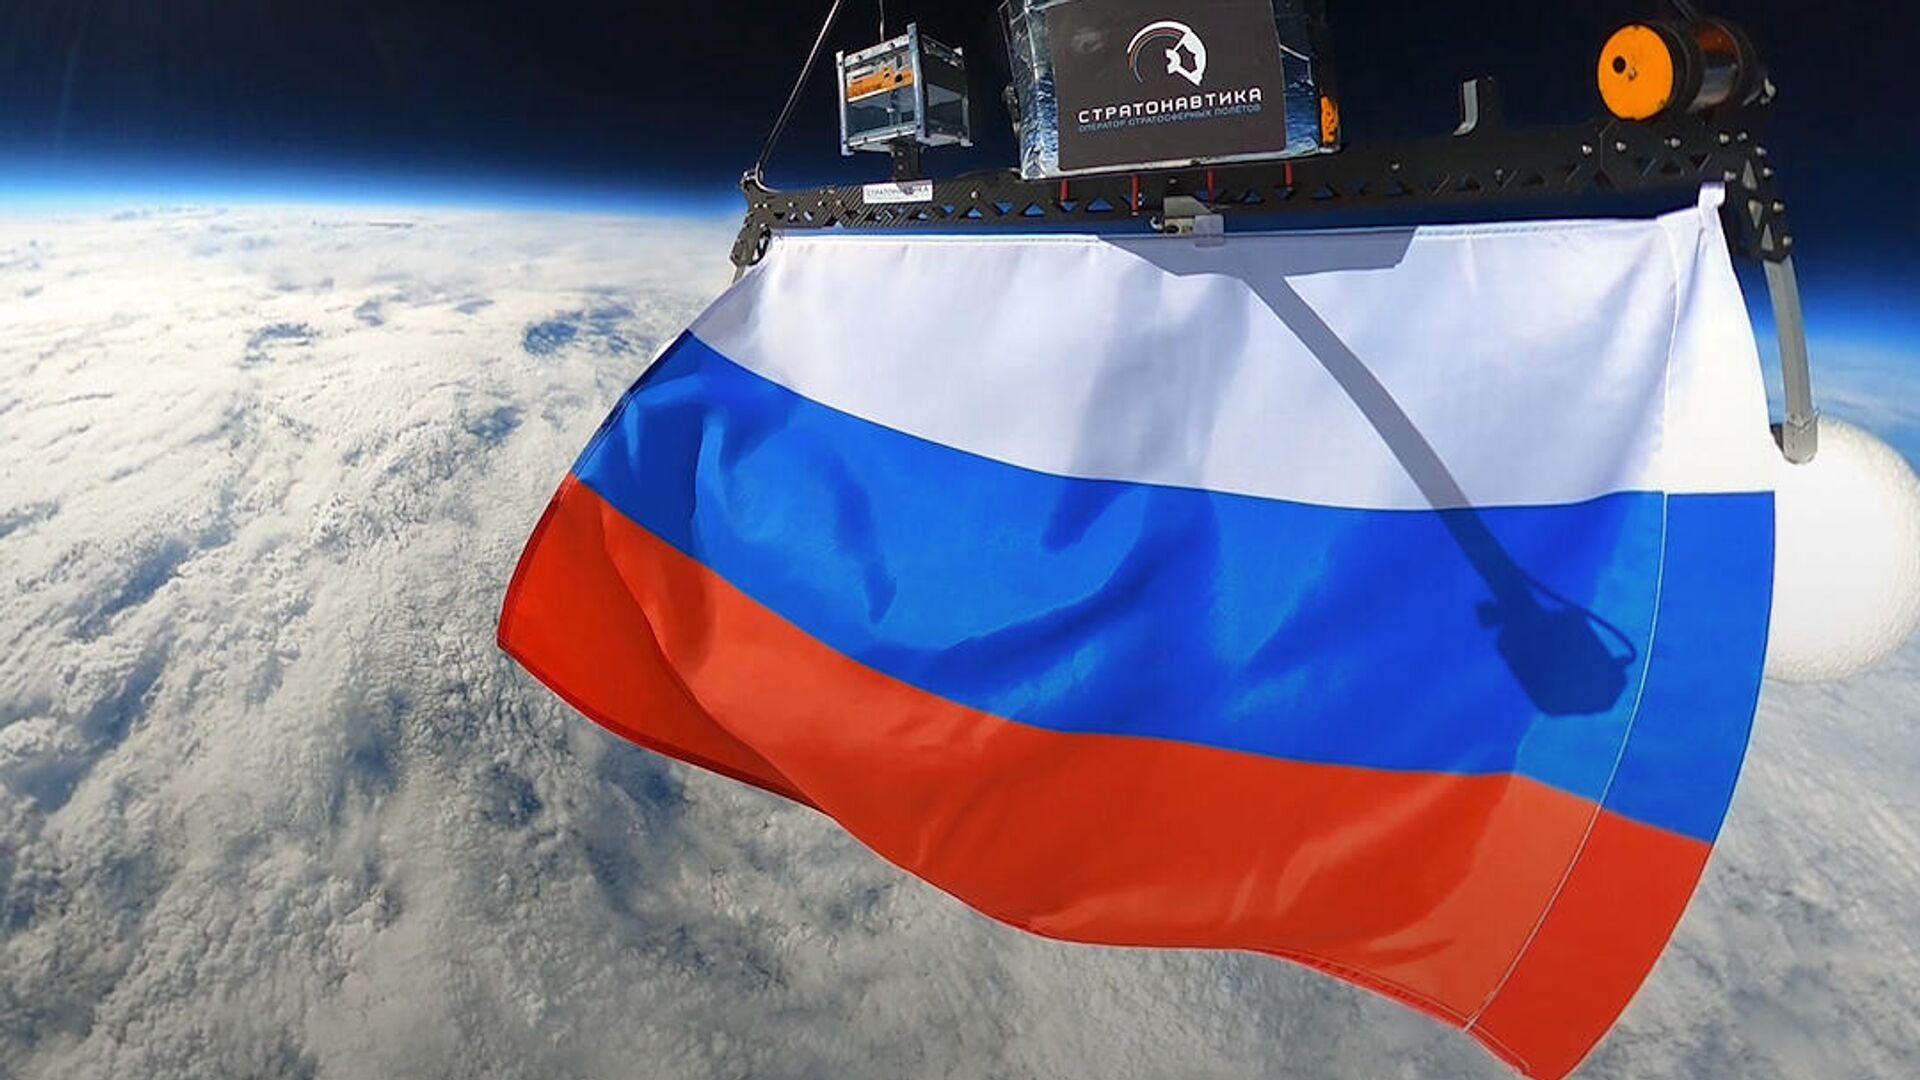 La bandera de Rusia colgada de una sonda espacial - Sputnik Mundo, 1920, 12.06.2021